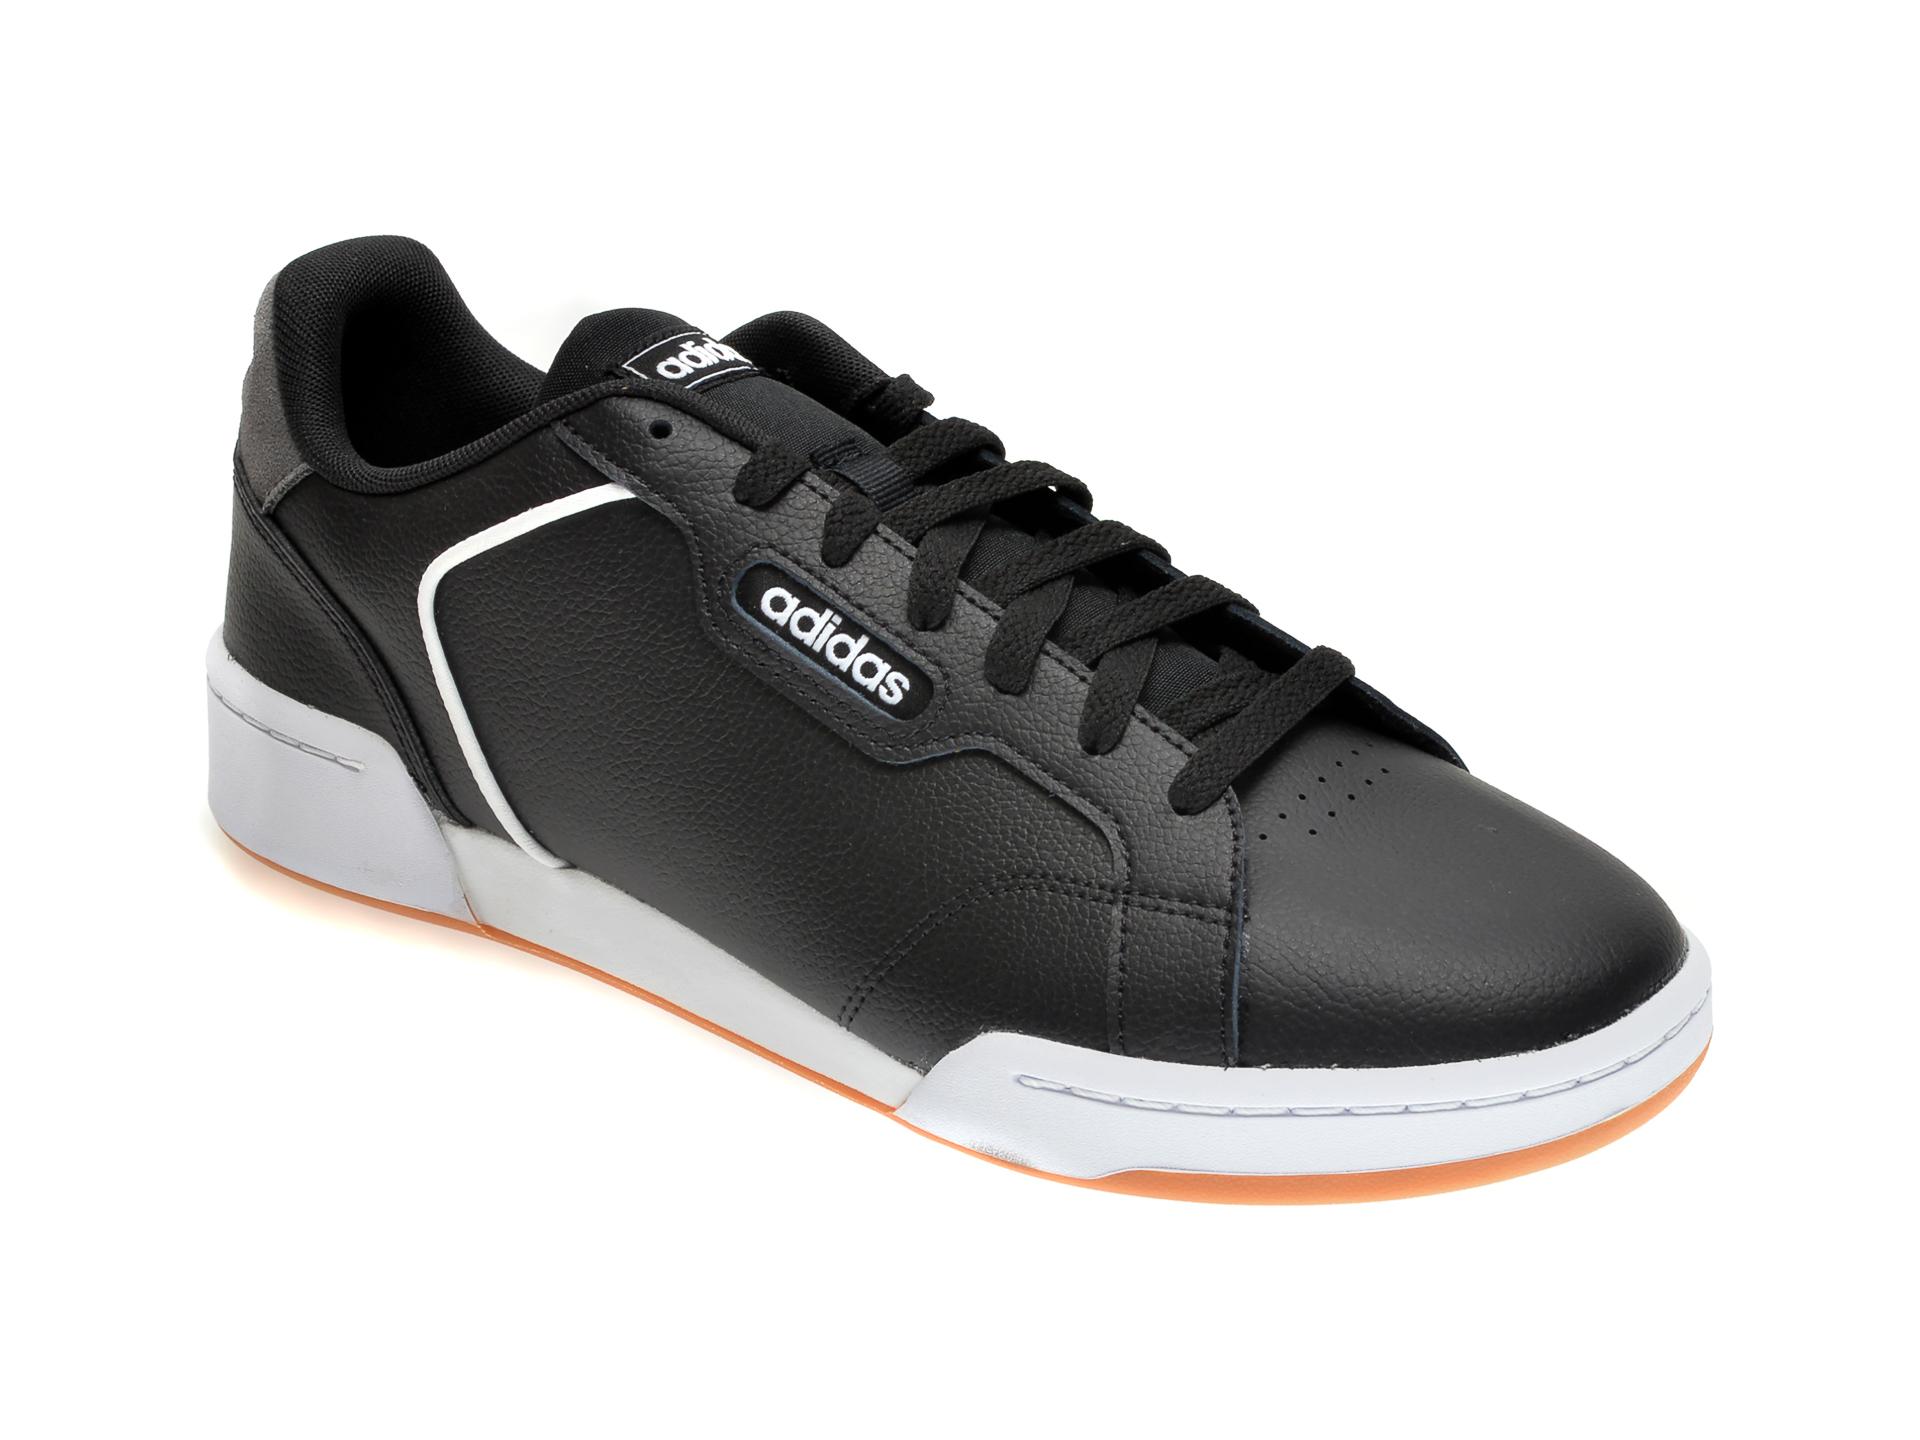 Pantofi sport ADIDAS negri, ROGUERA, din piele naturala imagine